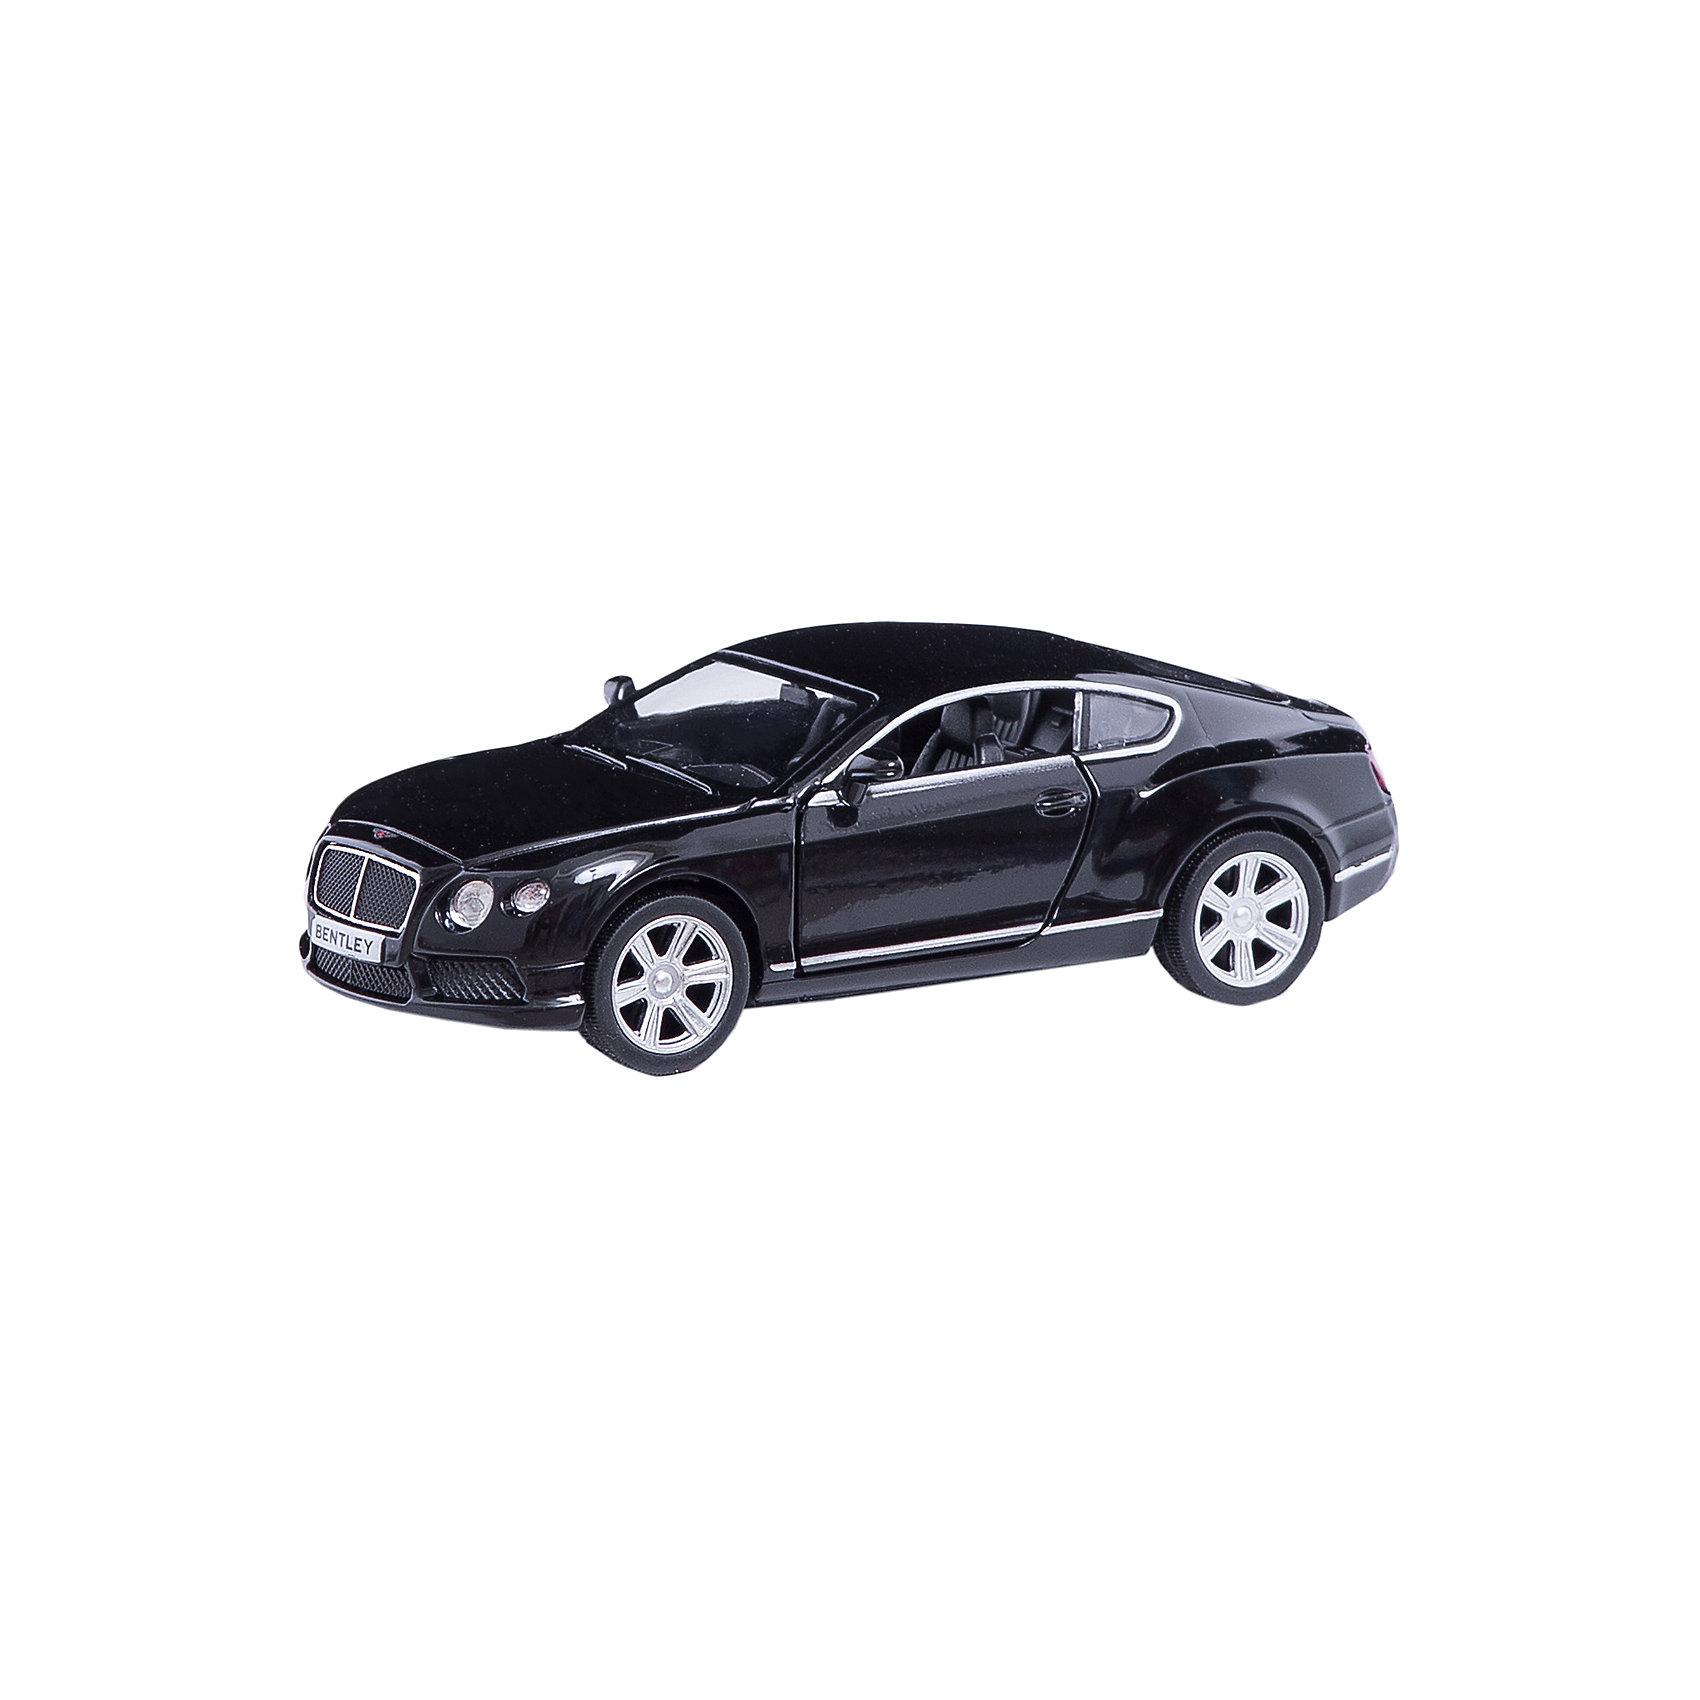 Машинка Bentley Continental GT V8 5, AutotimeМашинки<br><br><br>Ширина мм: 165<br>Глубина мм: 57<br>Высота мм: 75<br>Вес г: 13<br>Возраст от месяцев: 36<br>Возраст до месяцев: 2147483647<br>Пол: Мужской<br>Возраст: Детский<br>SKU: 5584104